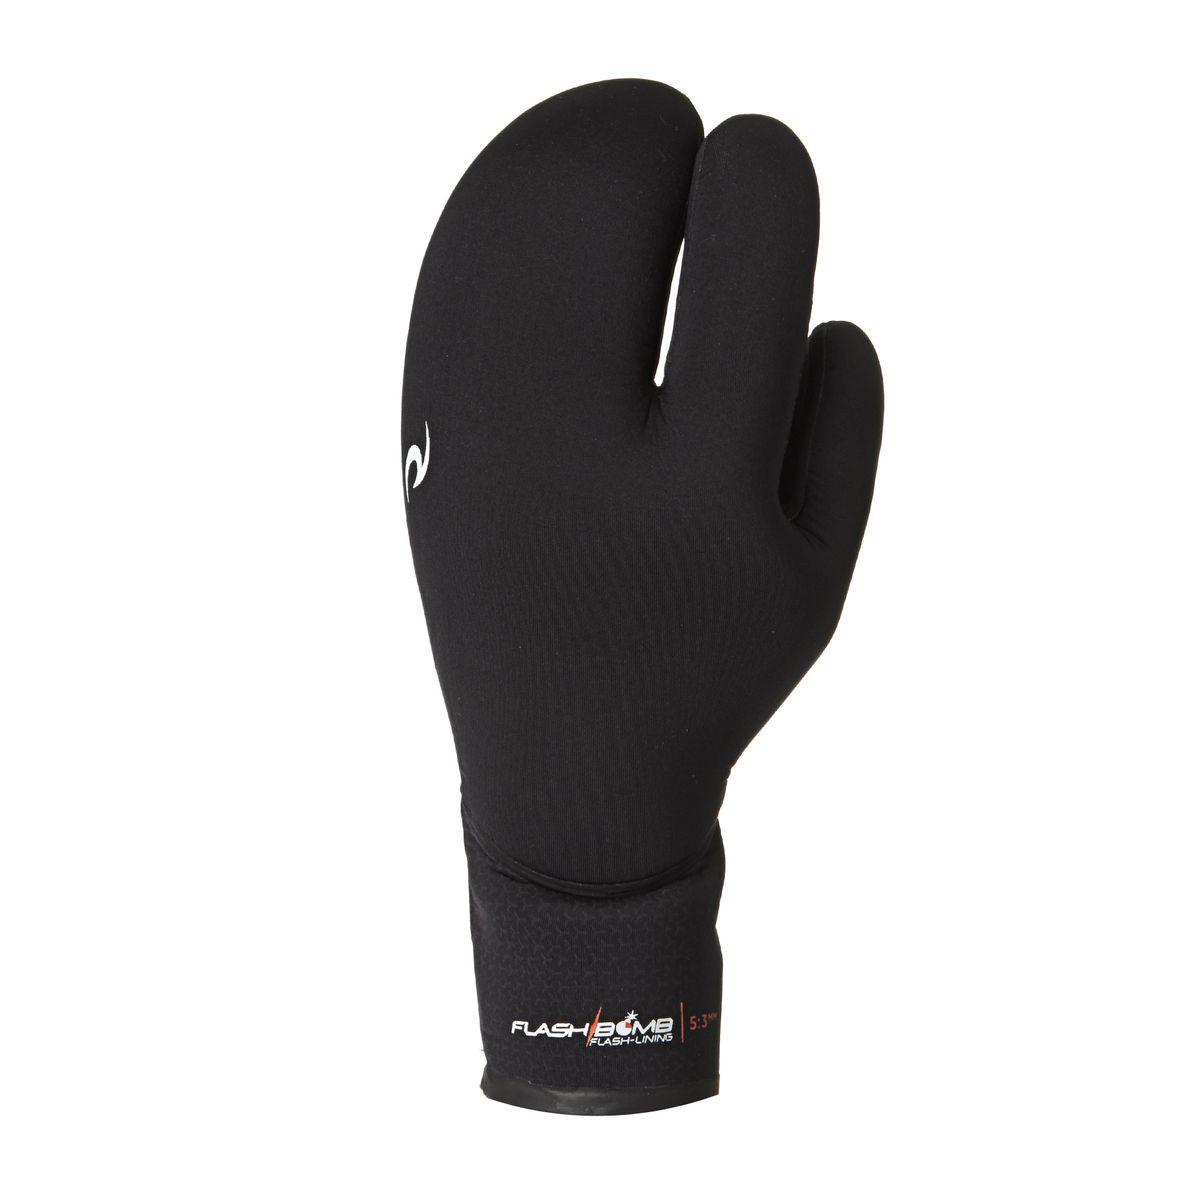 Rip Curl Flashbomb 5/3mm 3 Finger Wetsuit Gloves - Black